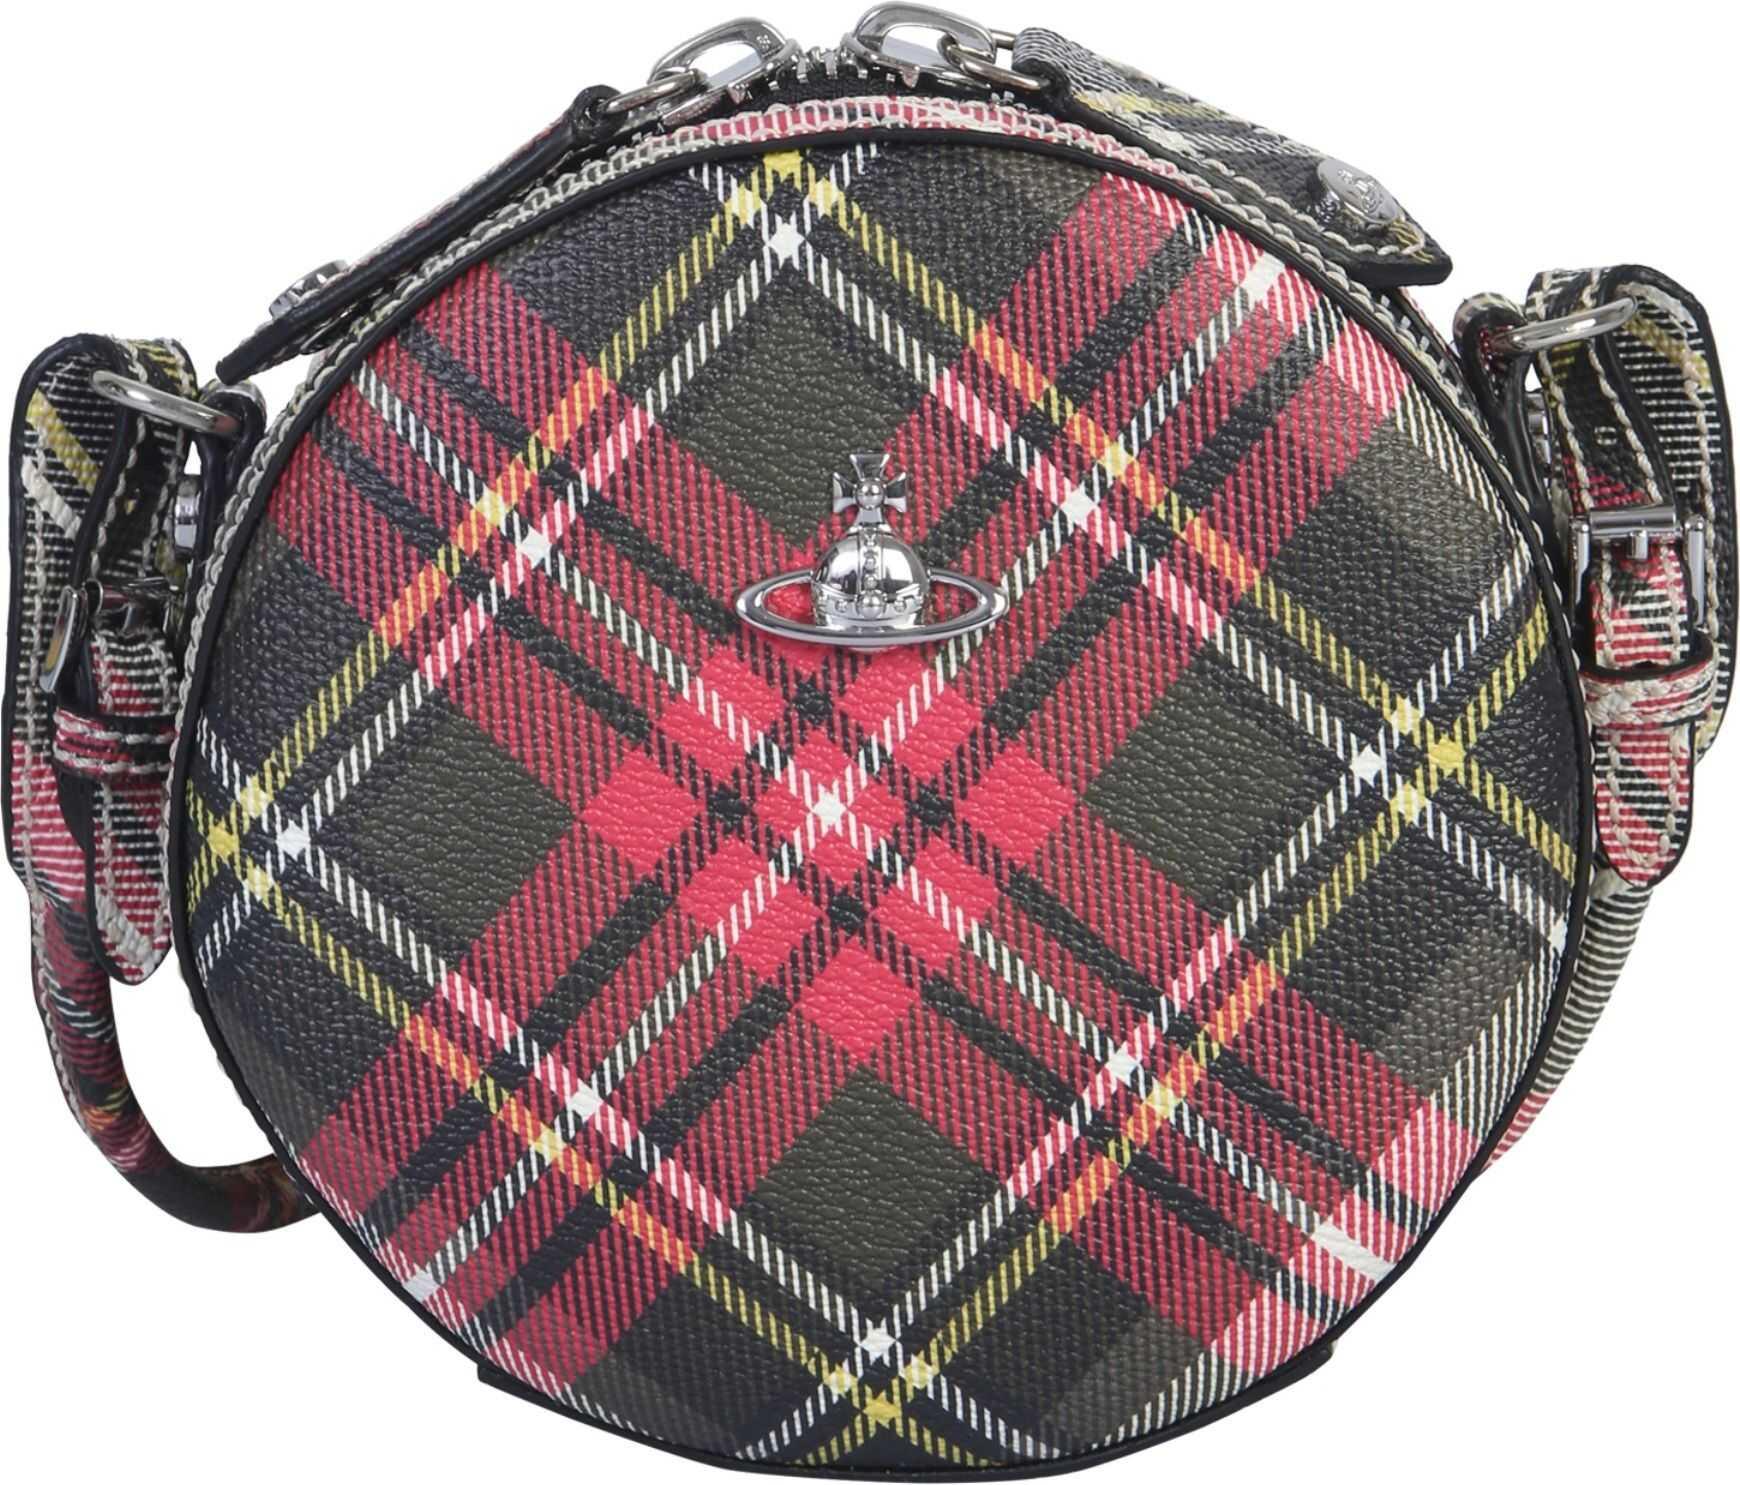 Vivienne Westwood Derby Shoulder Bag MULTICOLOUR